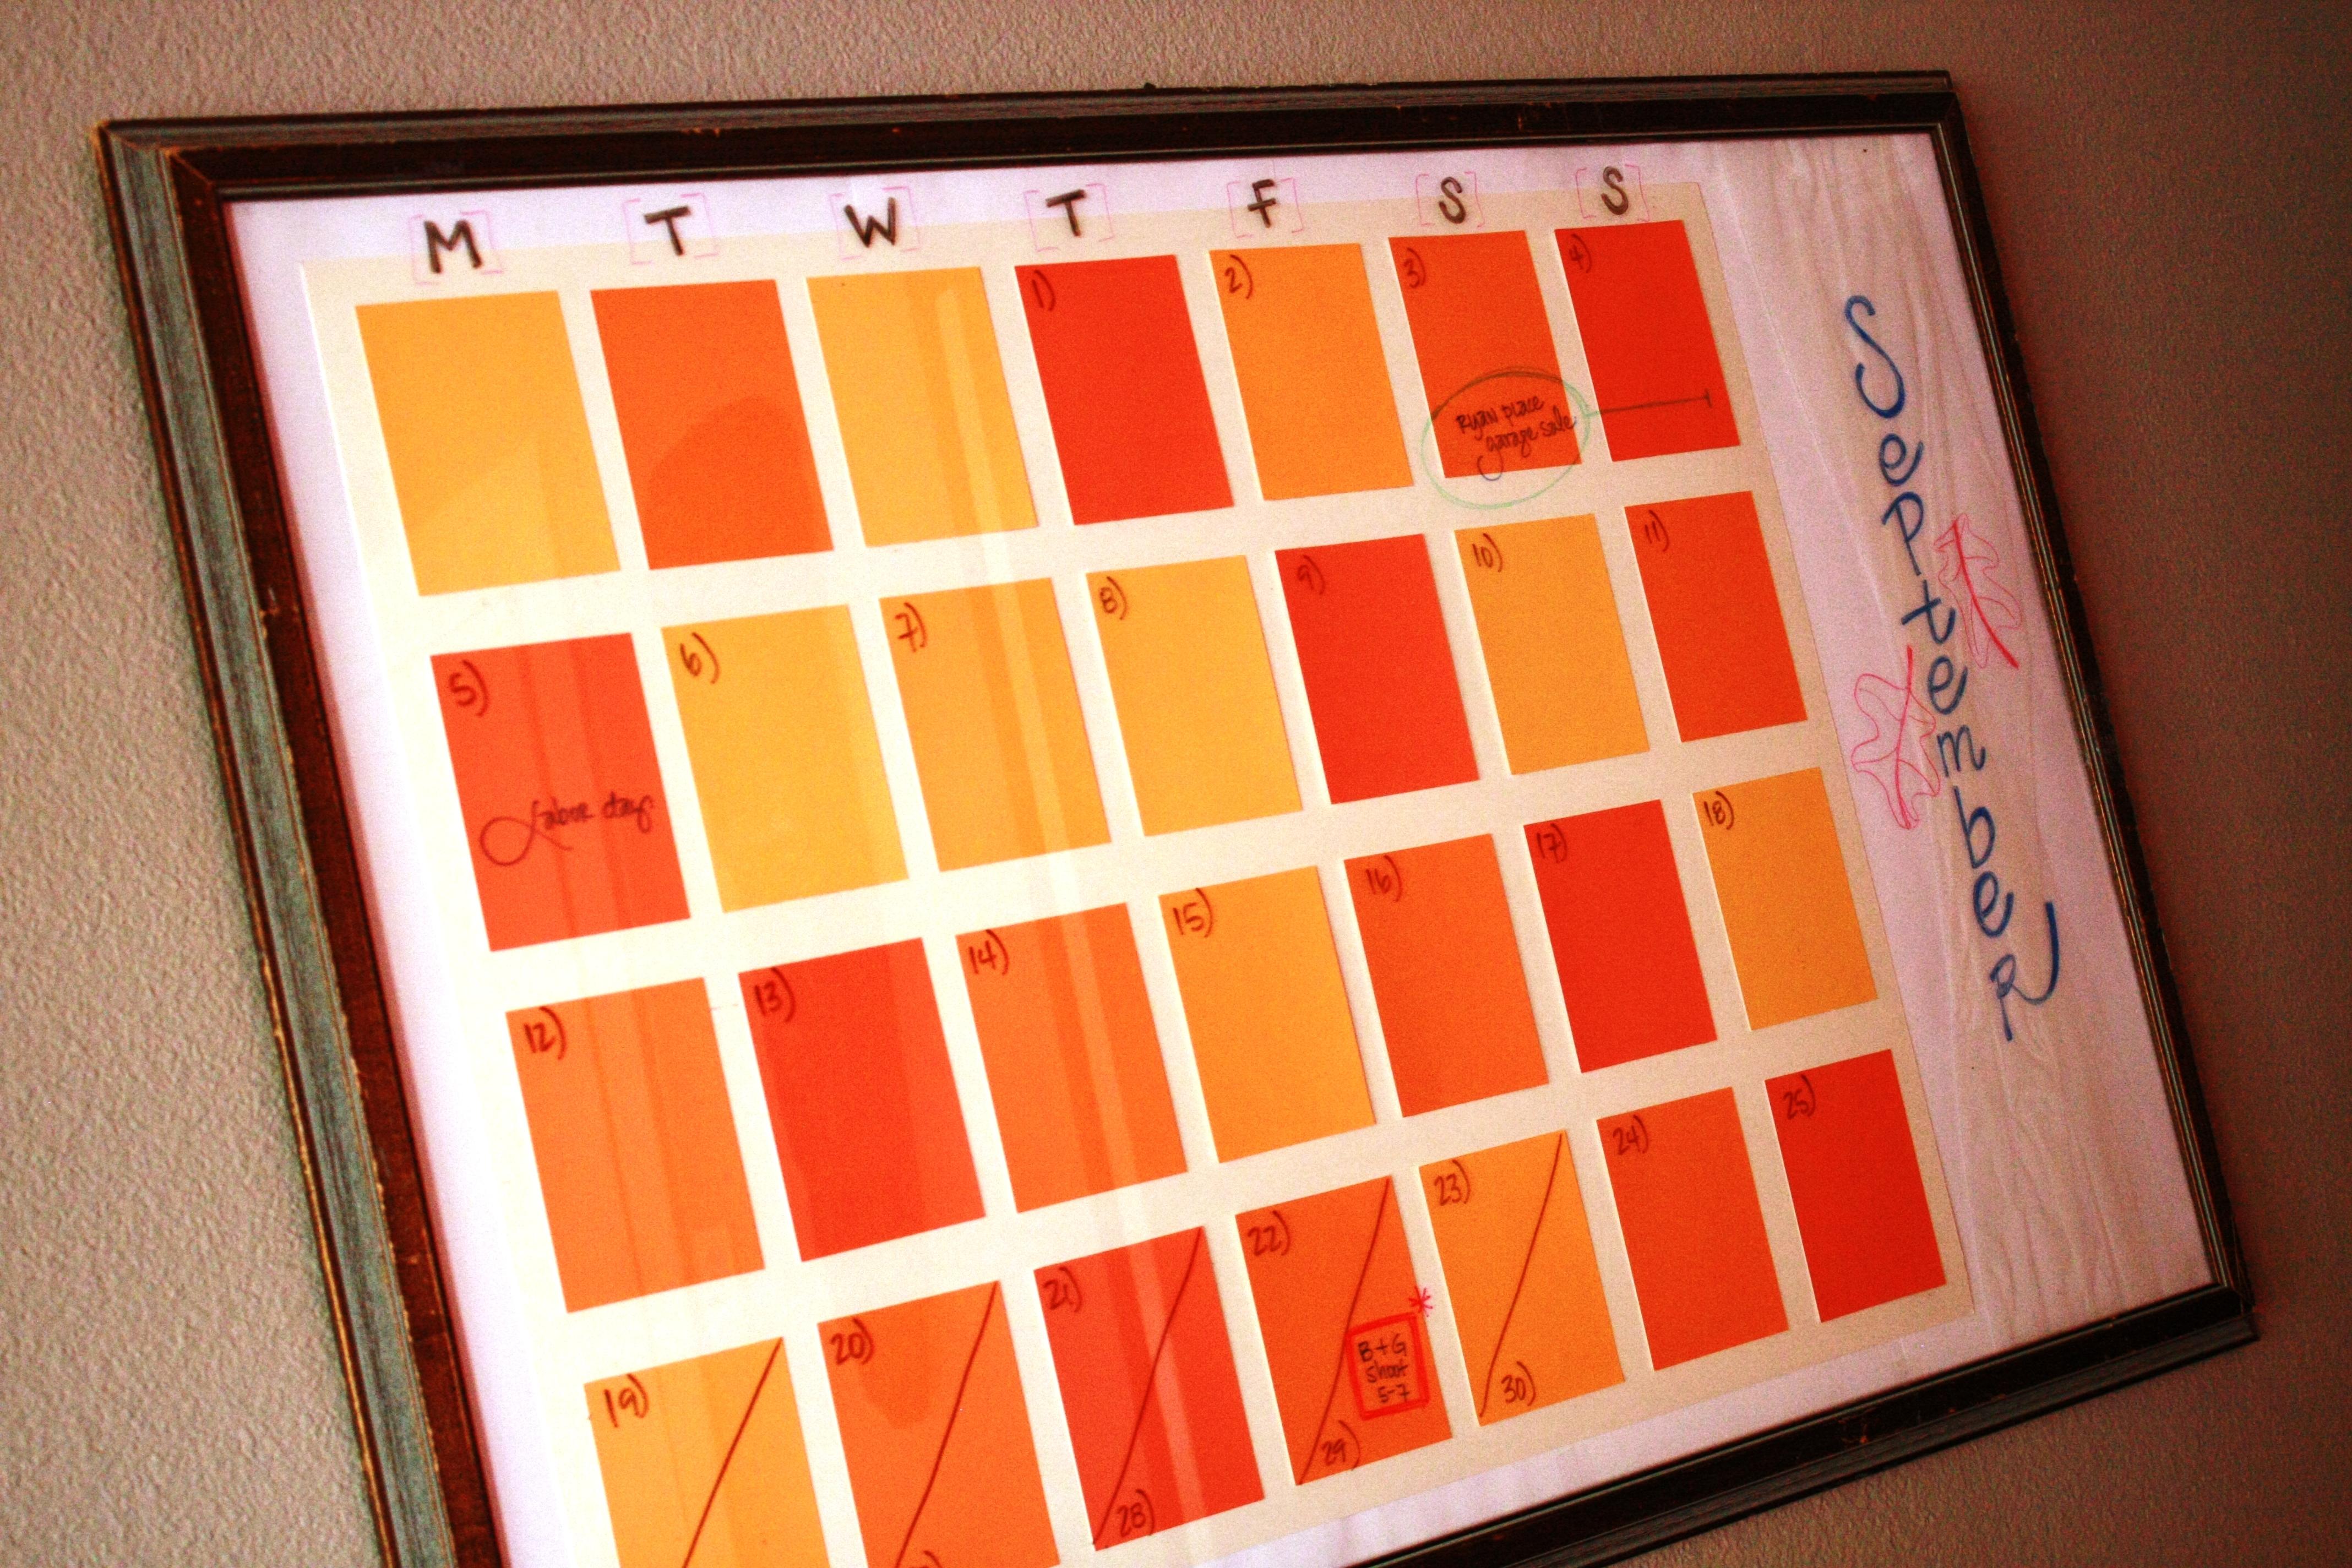 Diy Paint Strip Calendar : Paint chip wall calendar diy leftoverlemons